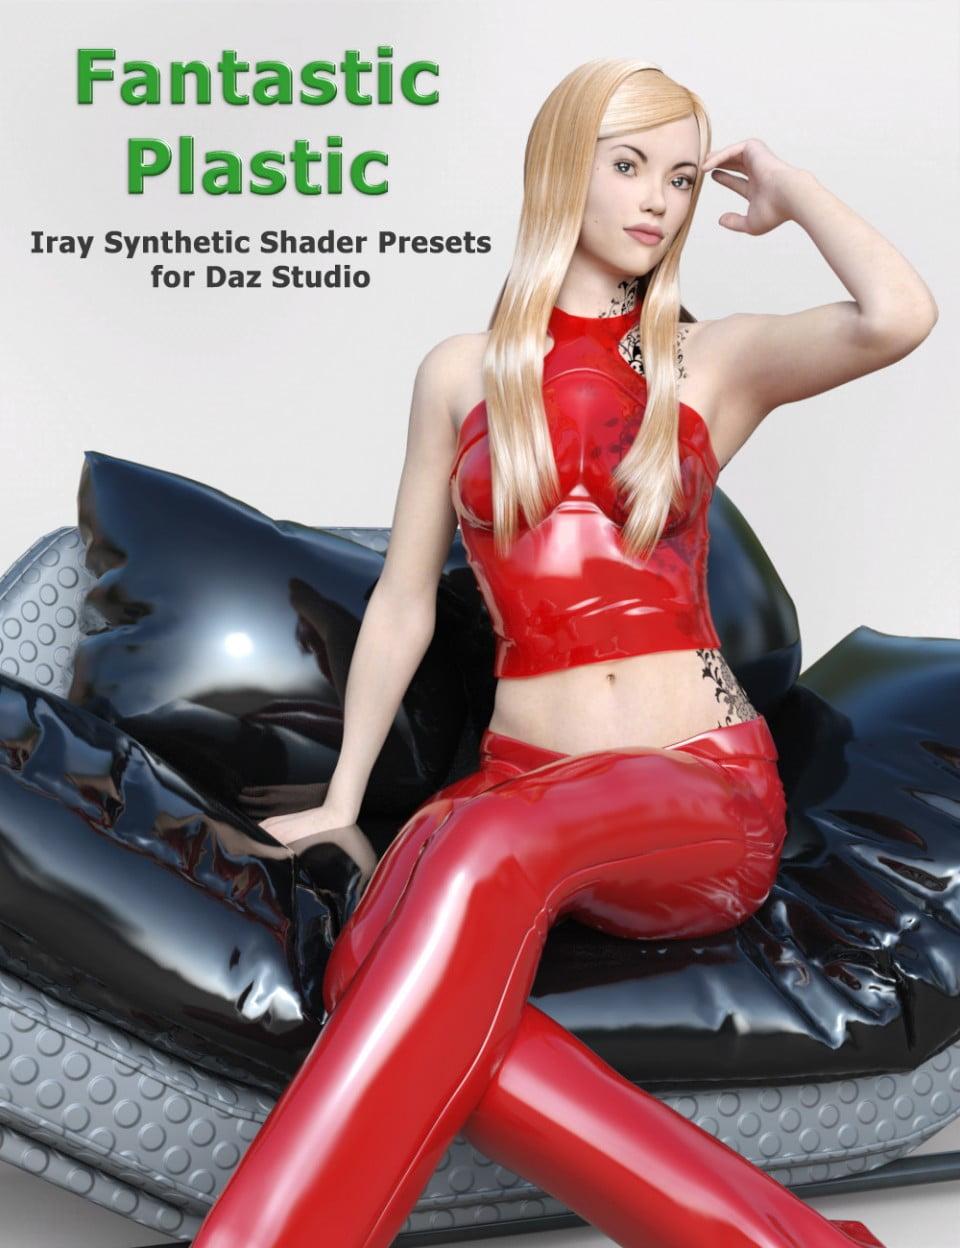 E1 Fantastic Plastic – Iray Synthetic Shader Presets for Daz Studio